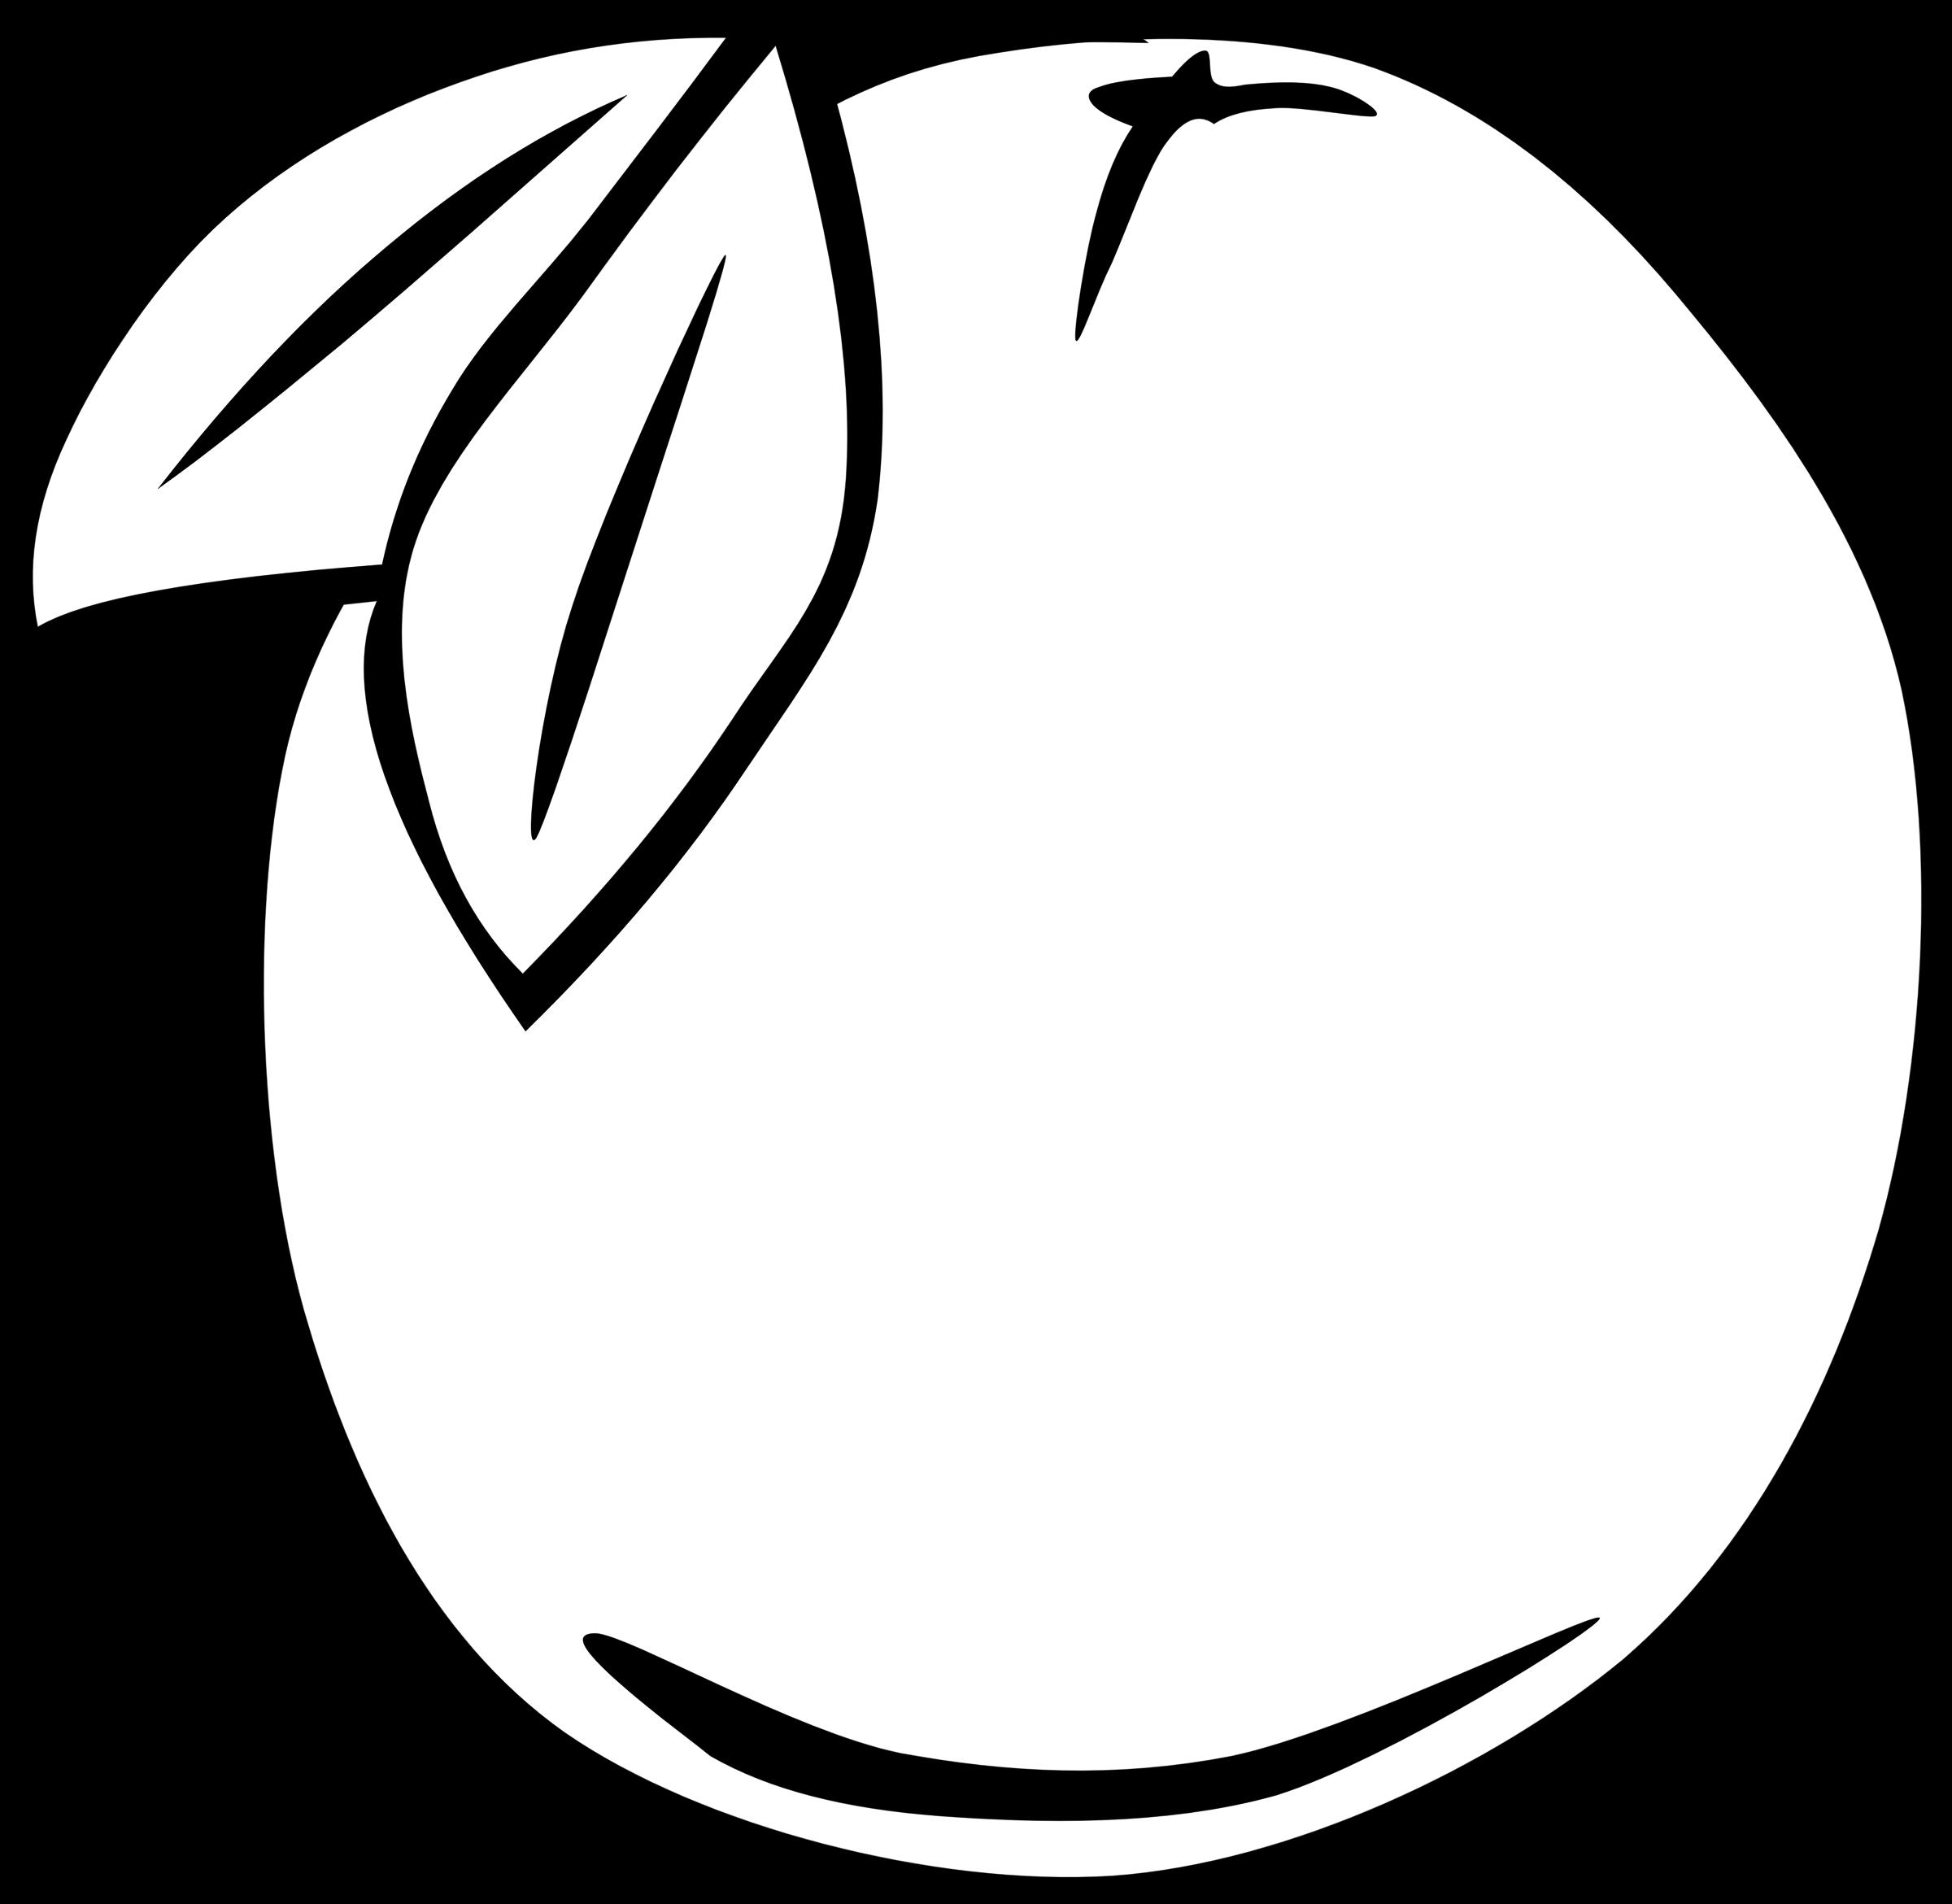 Simple orange big image. Fruit clipart template